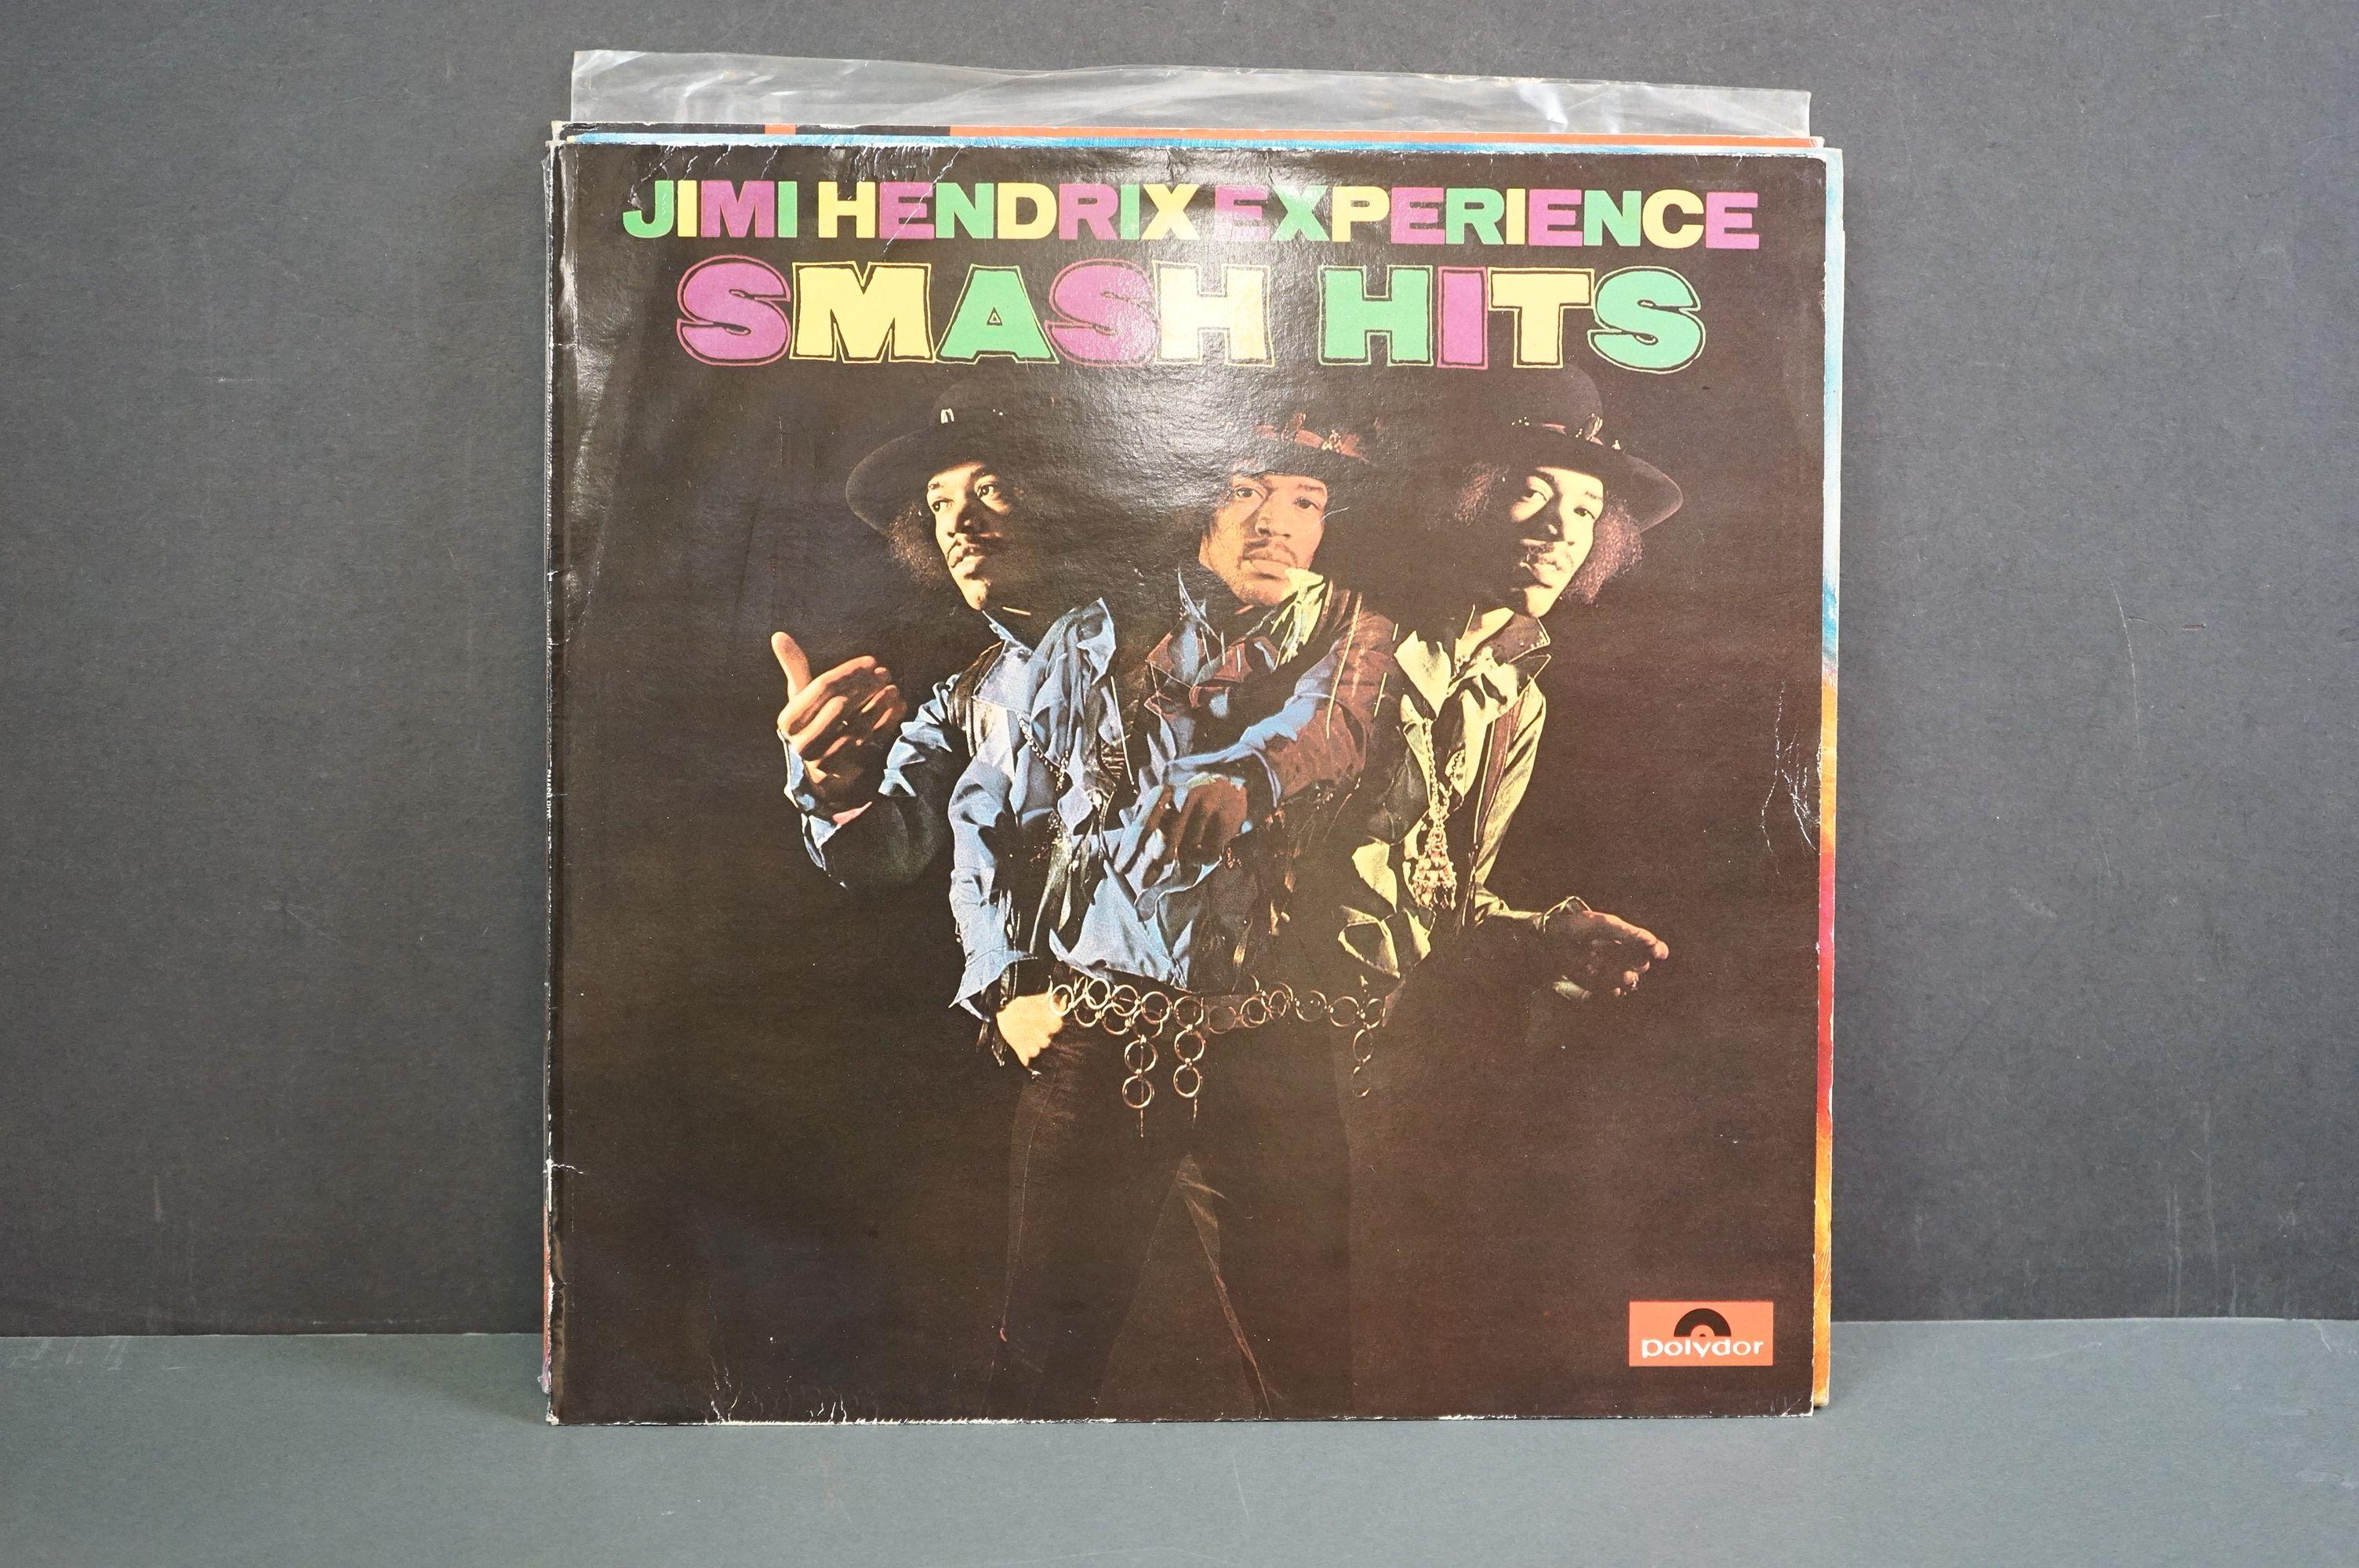 Vinyl - Nine Jimi Hendrix LPs to include Smash Hits, Hey Joe (Italian pressing), Stone Free, Jimi - Image 6 of 9